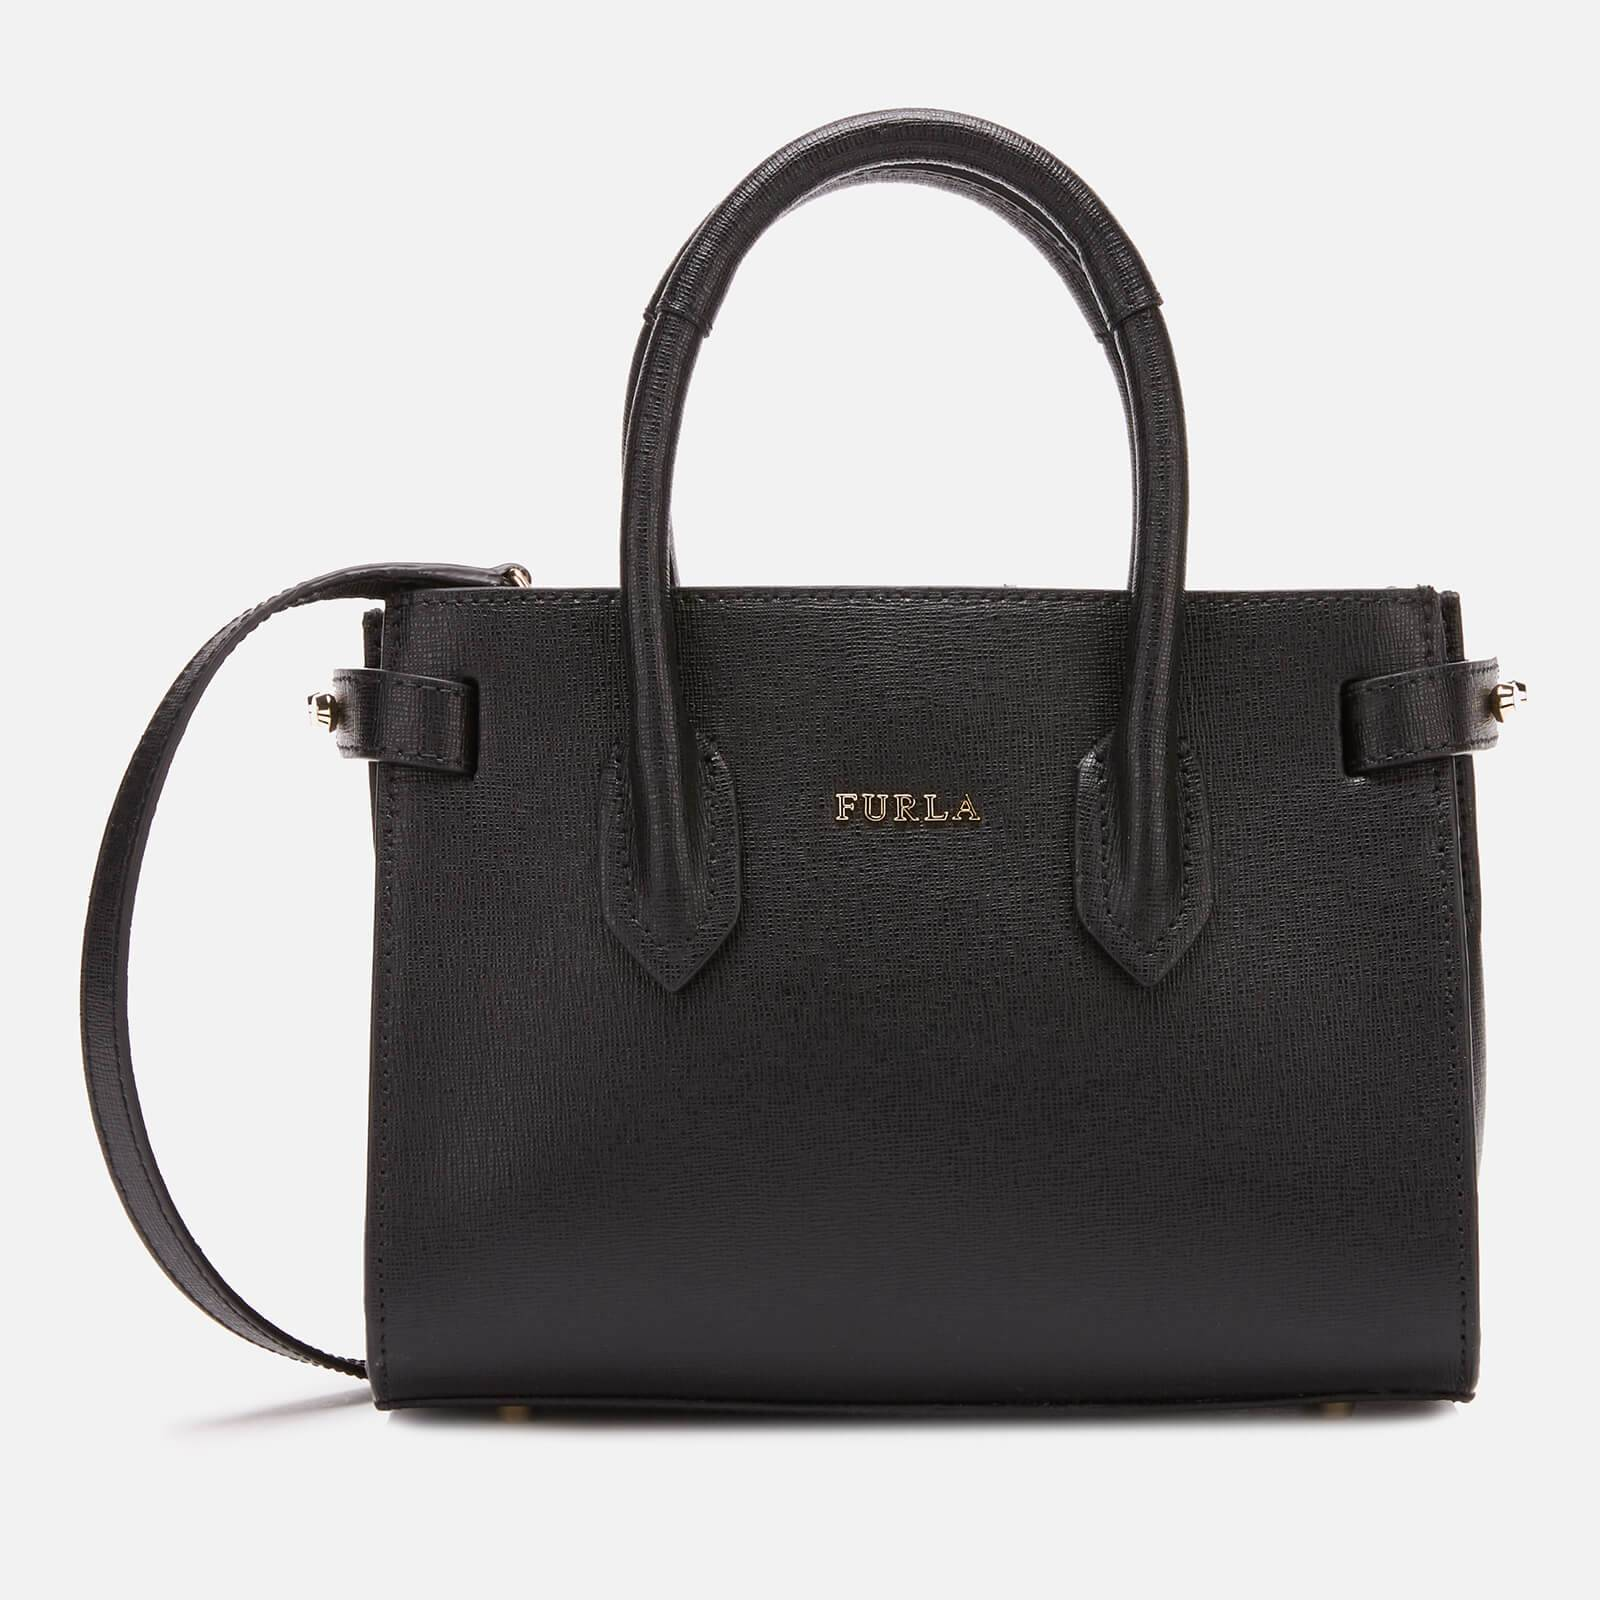 Furla Women's Pin Mini Tote Bag - Onyx